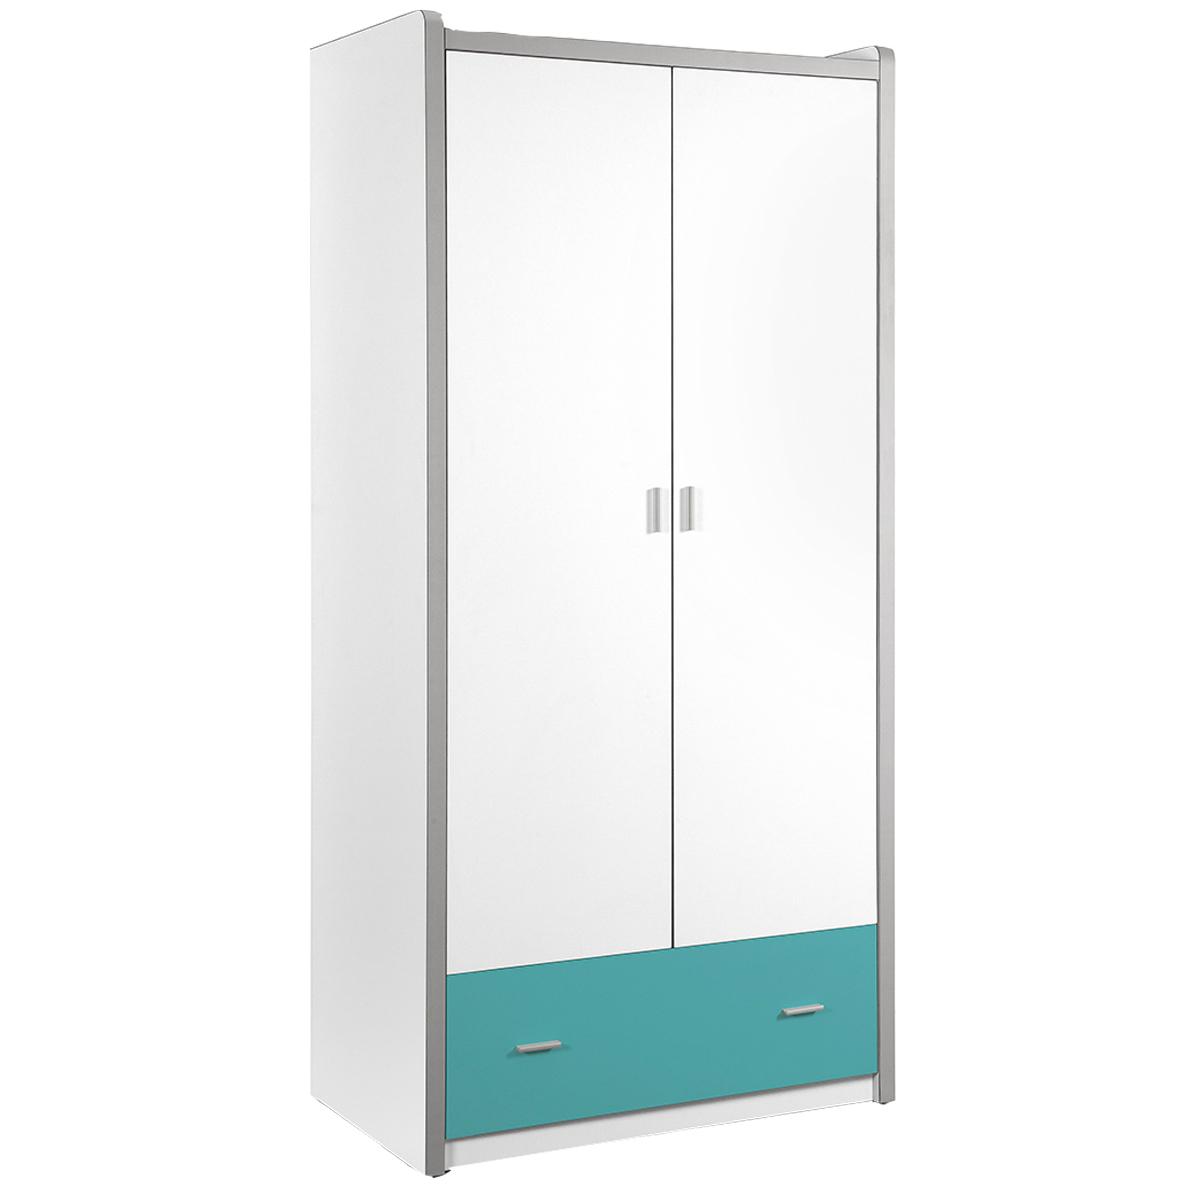 Vipack - Armoire 2 portes Bonny - Turquoise